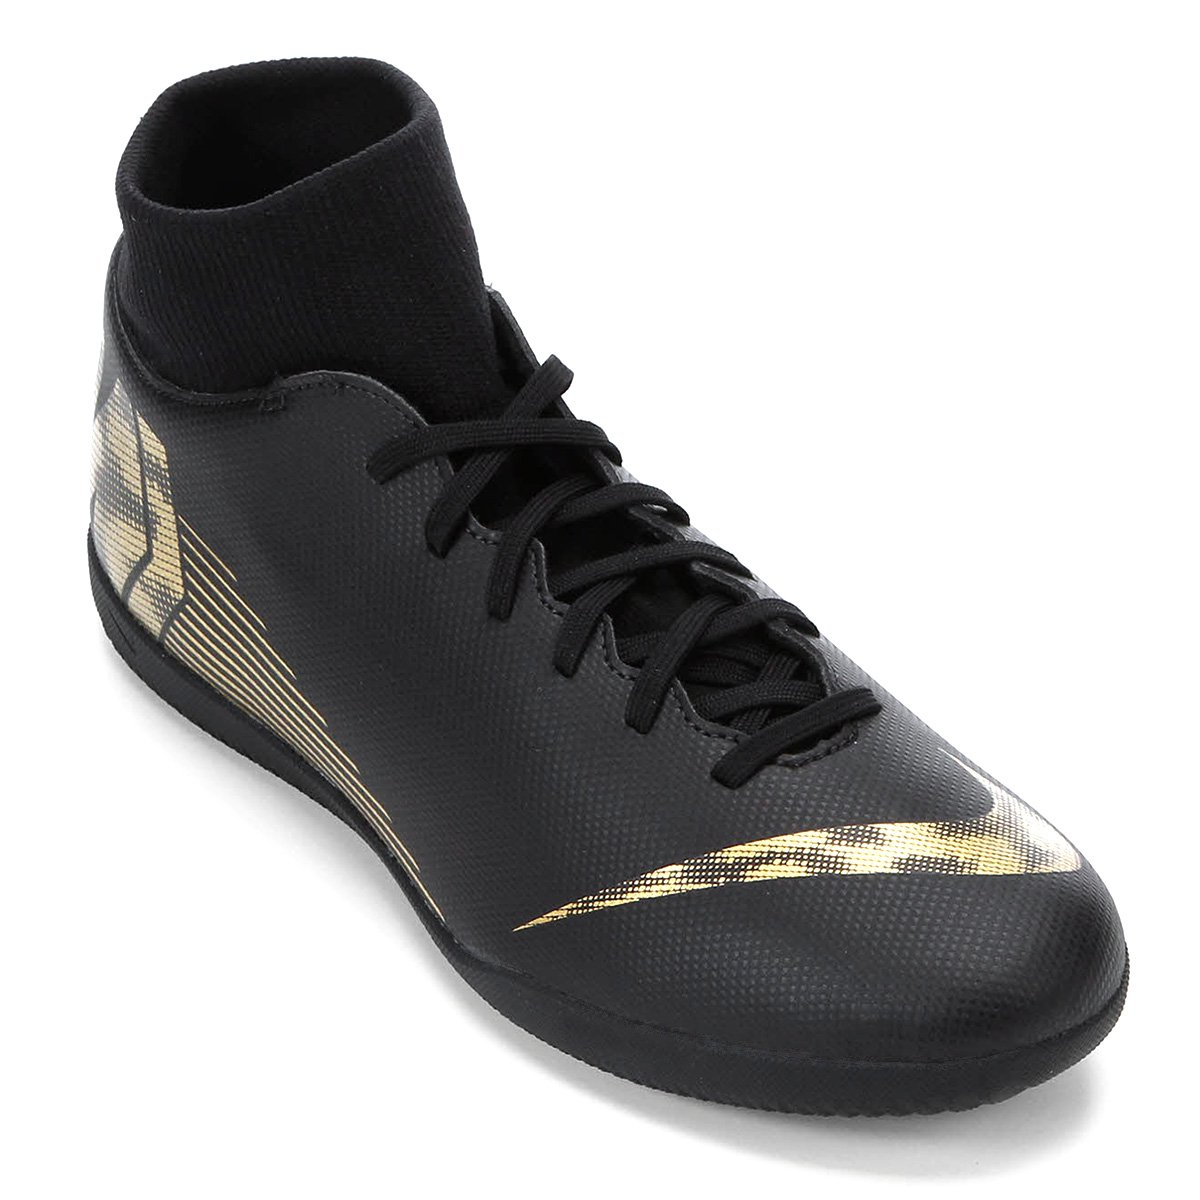 sports shoes 3f9ce dfe1c Chuteira Futsal Nike Mercurial Superfly 6 Club - Tam: 43 ...